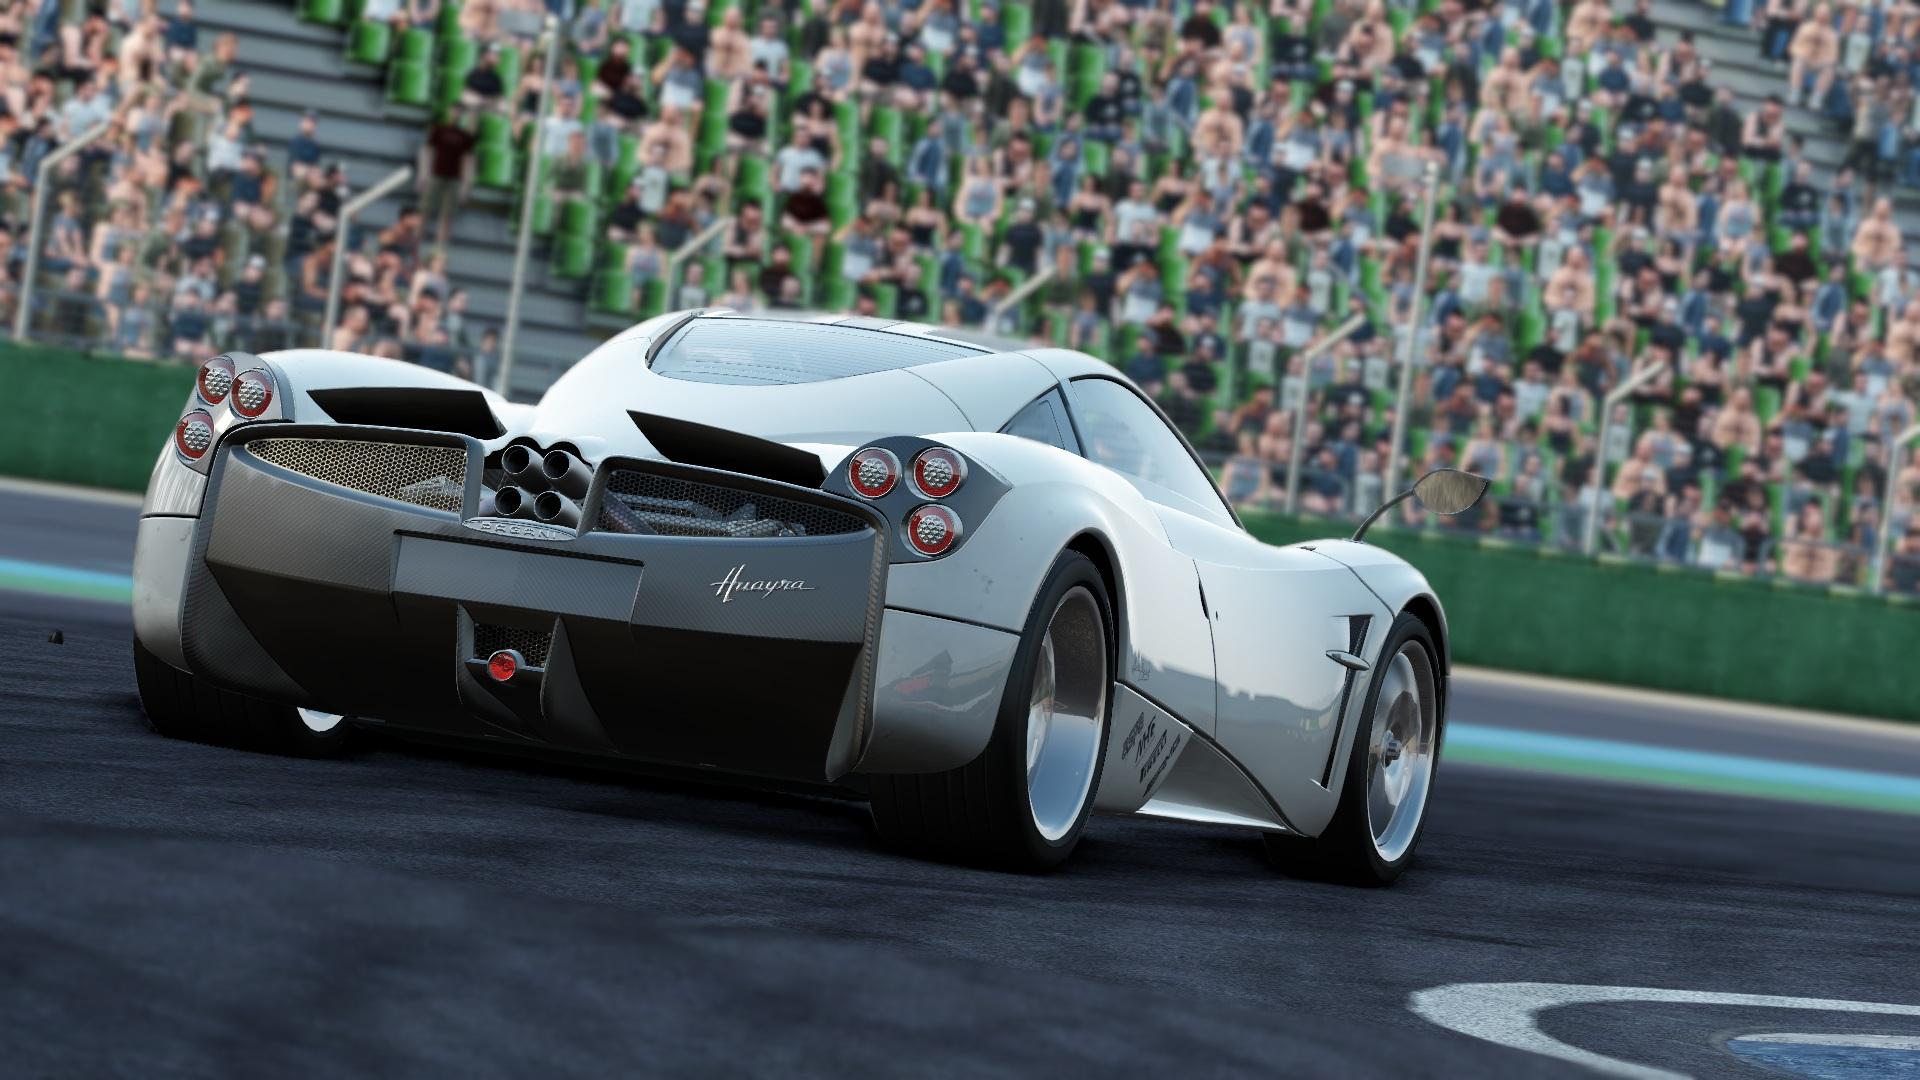 project cars: wahrhaftig atemberaubende screenshots des pagani huayra